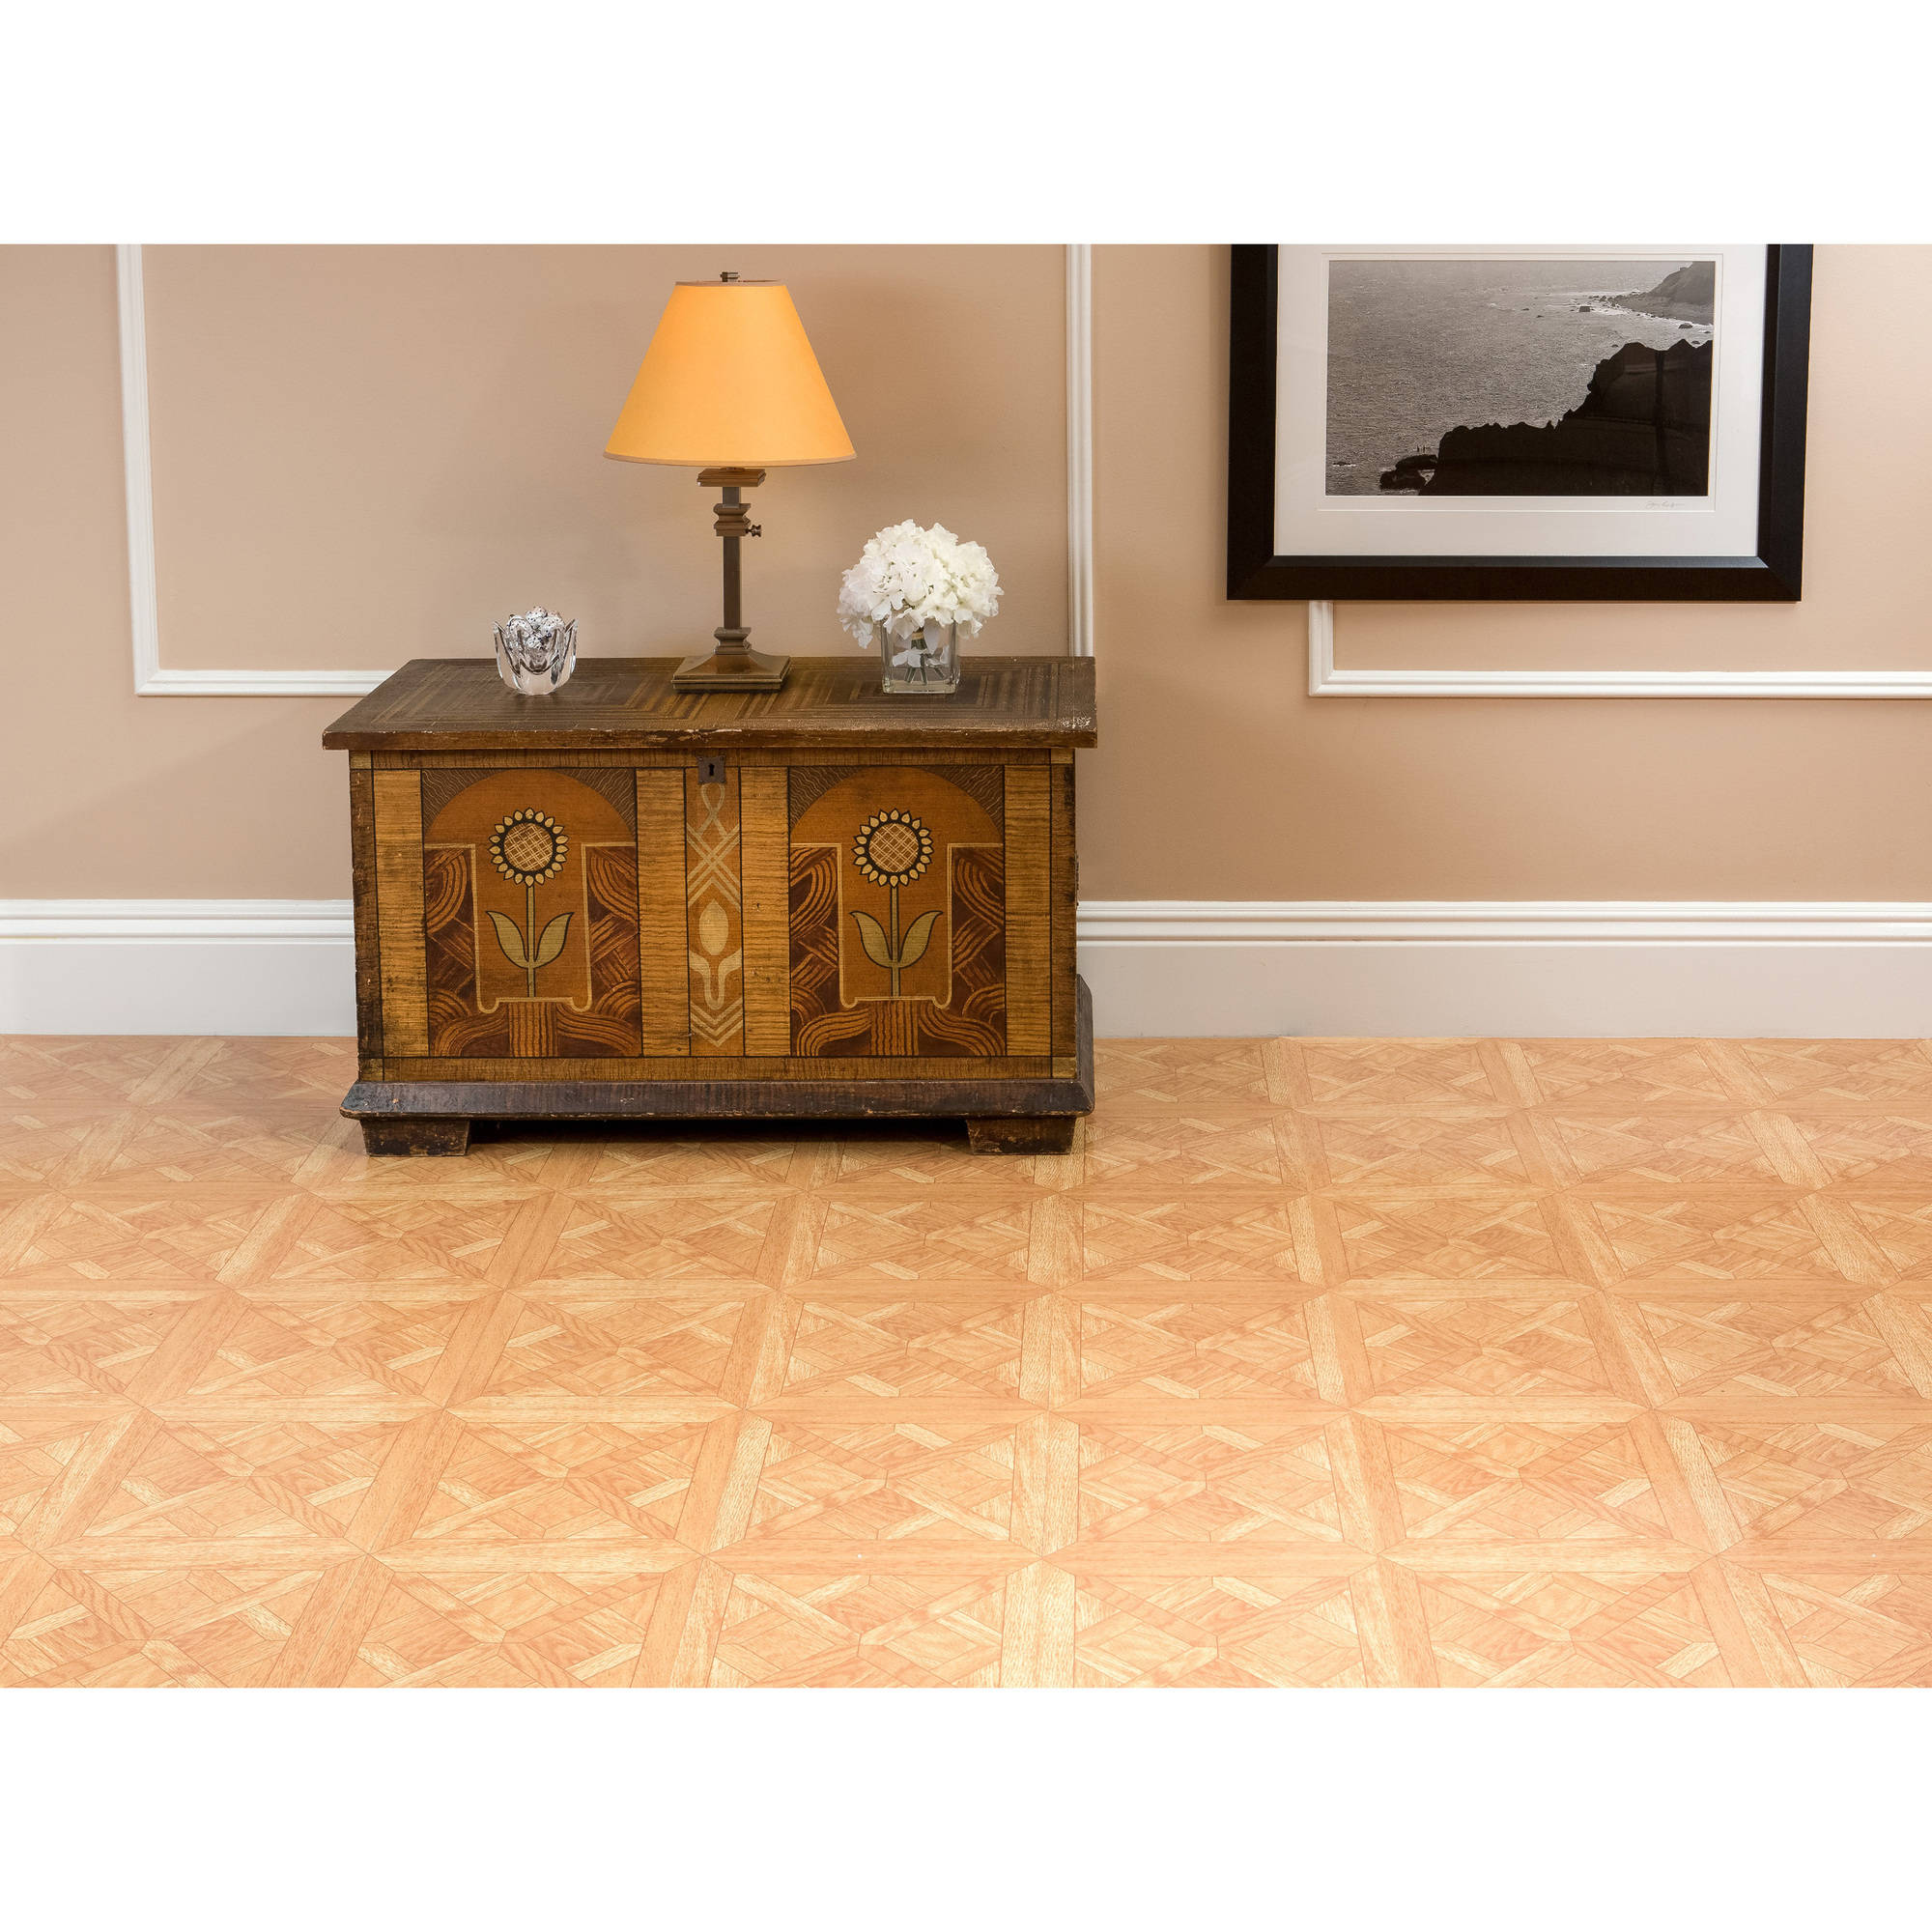 Tivoli classic parquet oak 12x12 self adhesive vinyl floor tile 45 tivoli classic parquet oak 12x12 self adhesive vinyl floor tile 45 tiles45 sqft walmart dailygadgetfo Choice Image